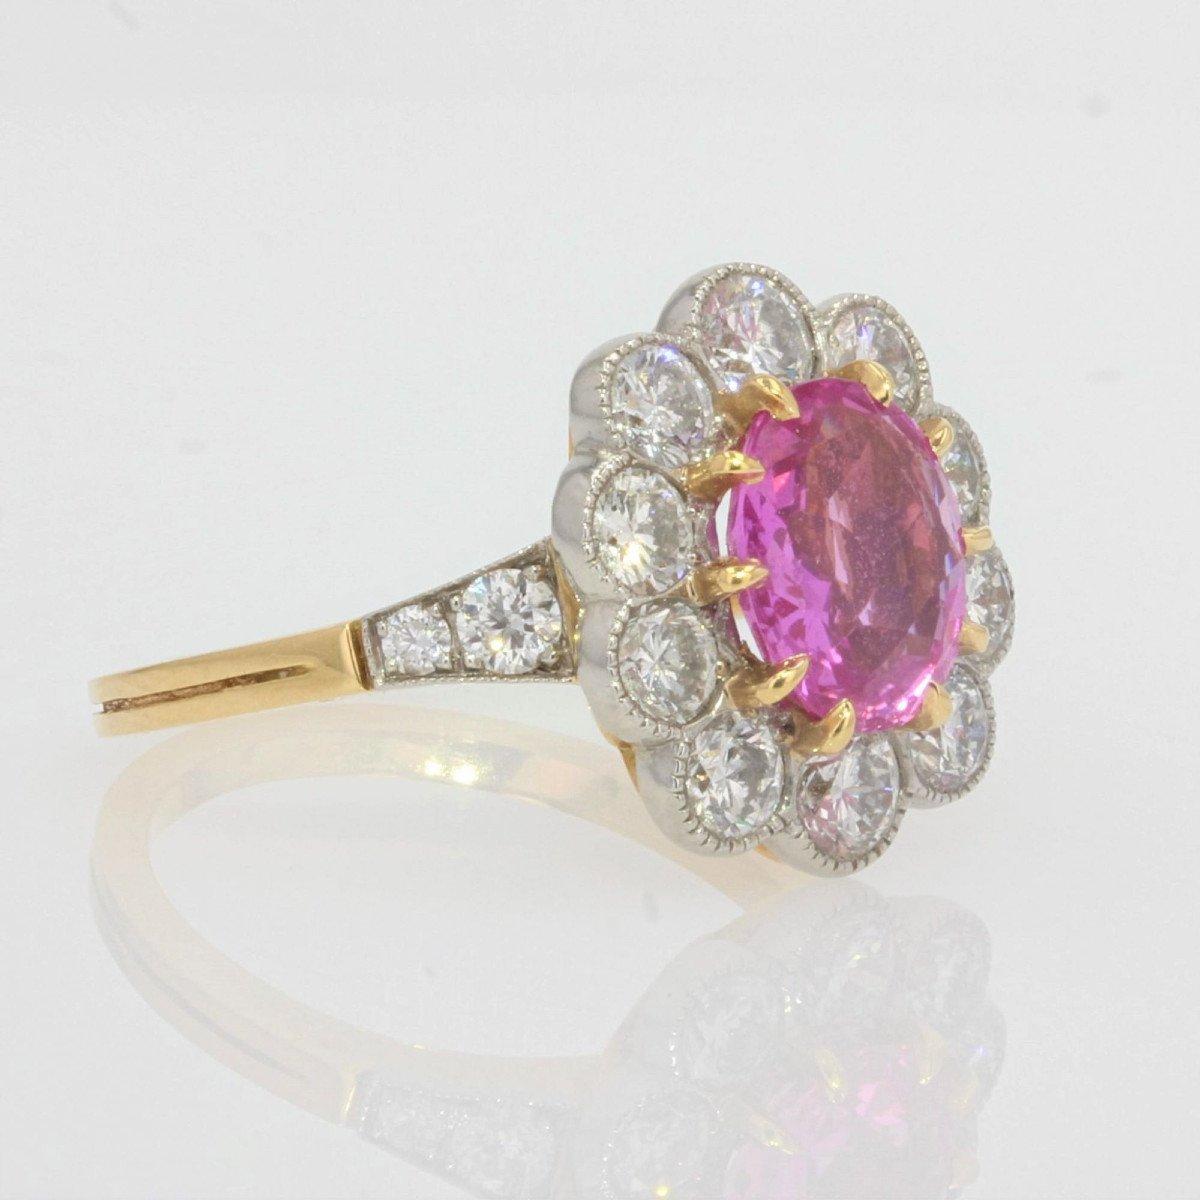 Bague Marguerite Saphir Rose Diamants Or Platine-photo-4